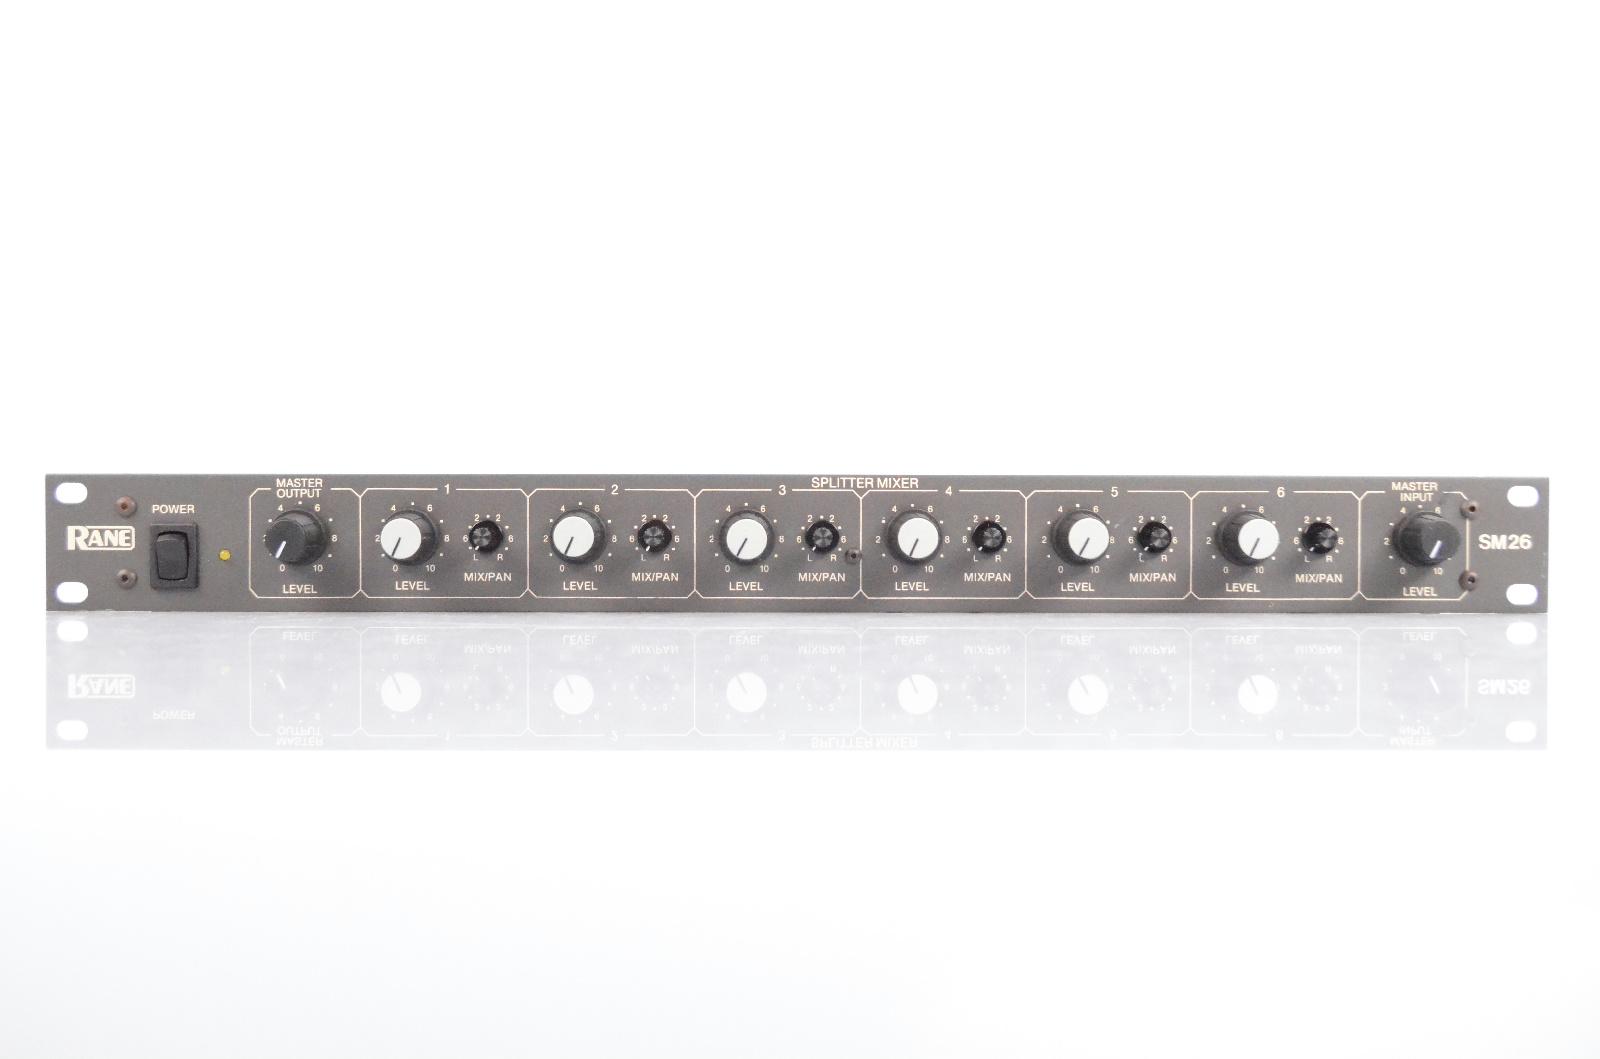 Rane SM26 6 Channel Line Mixer & 2 Way Splitter w/ 11 TS XLR Cables #31915